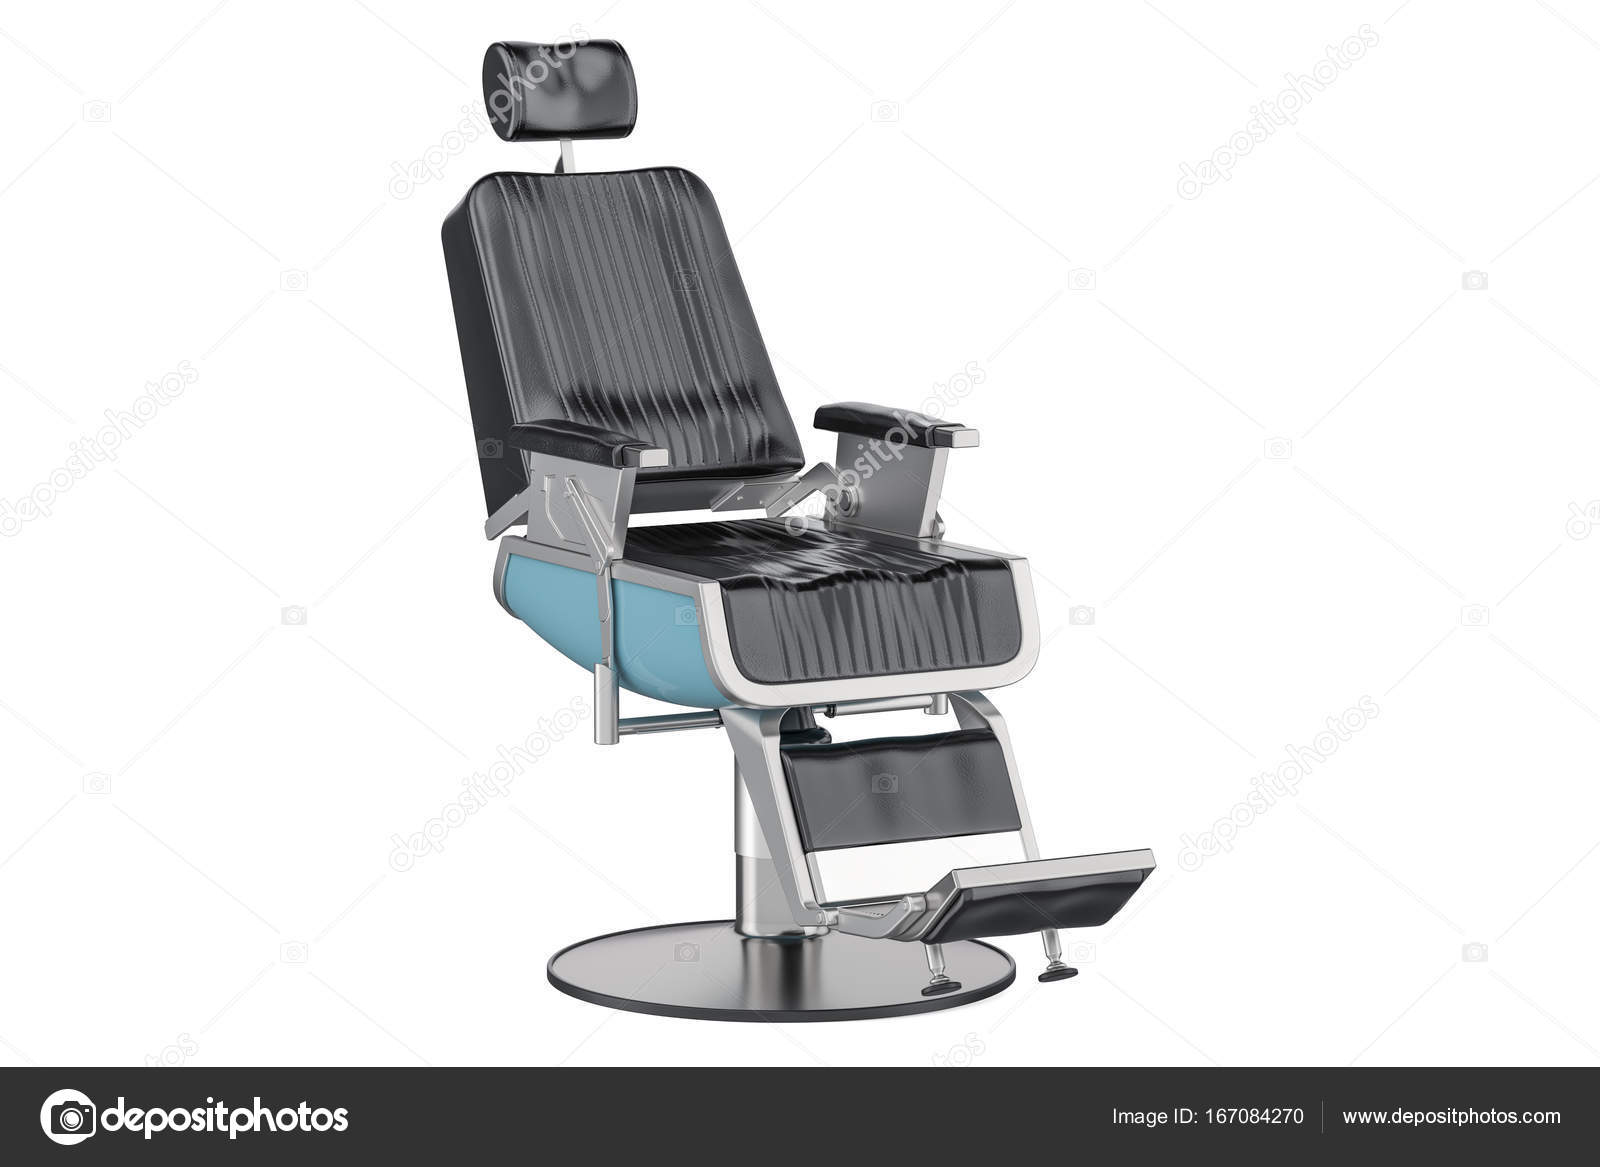 Nero sedia da barbiere rendering 3d u2014 foto stock © alexlmx #167084270